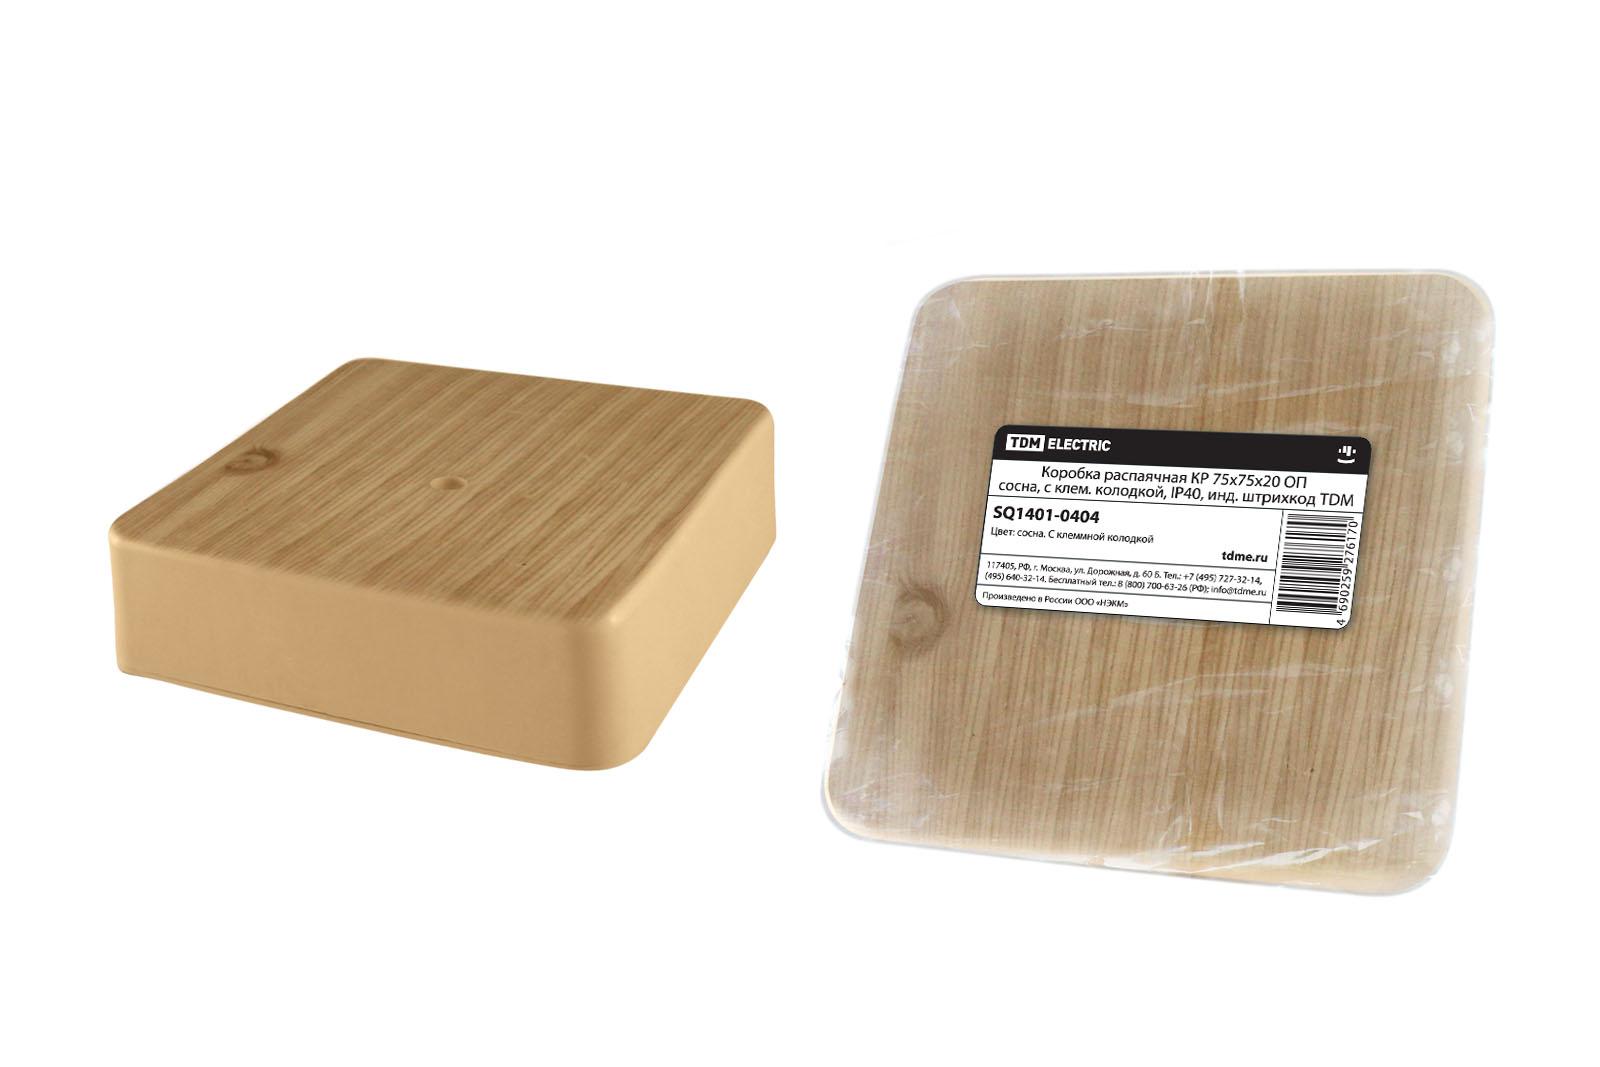 Фото Коробка распаячная КР 75х75х20 ОП сосна, с клем. колодкой, IP40, инд. штрихкод TDM {SQ1401-0404}